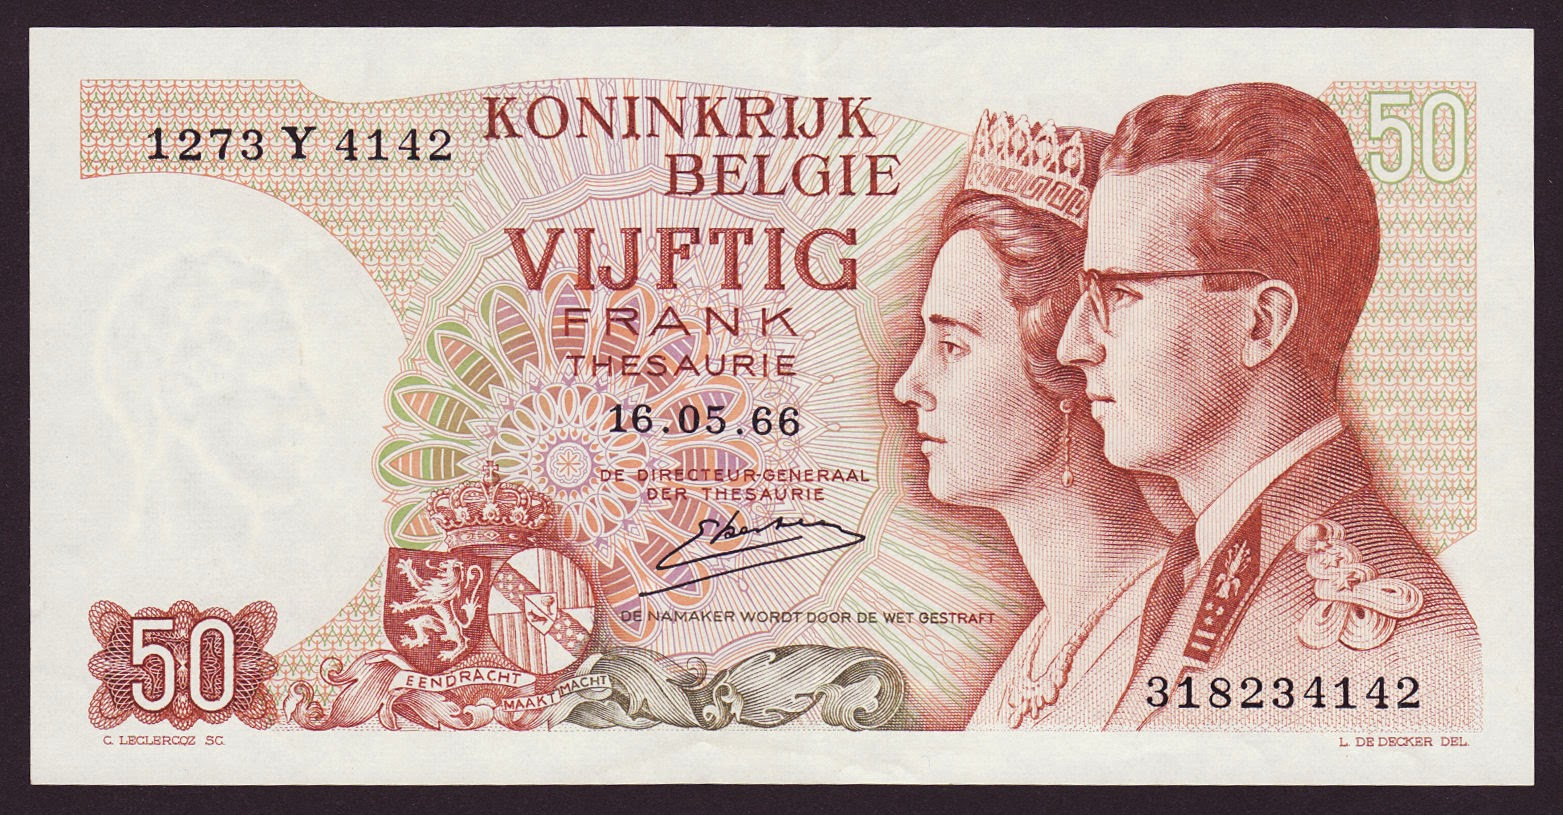 Belgium Banknotes 50 Francs Treasury Note 1966 King Baudouin and Queen Fabiola